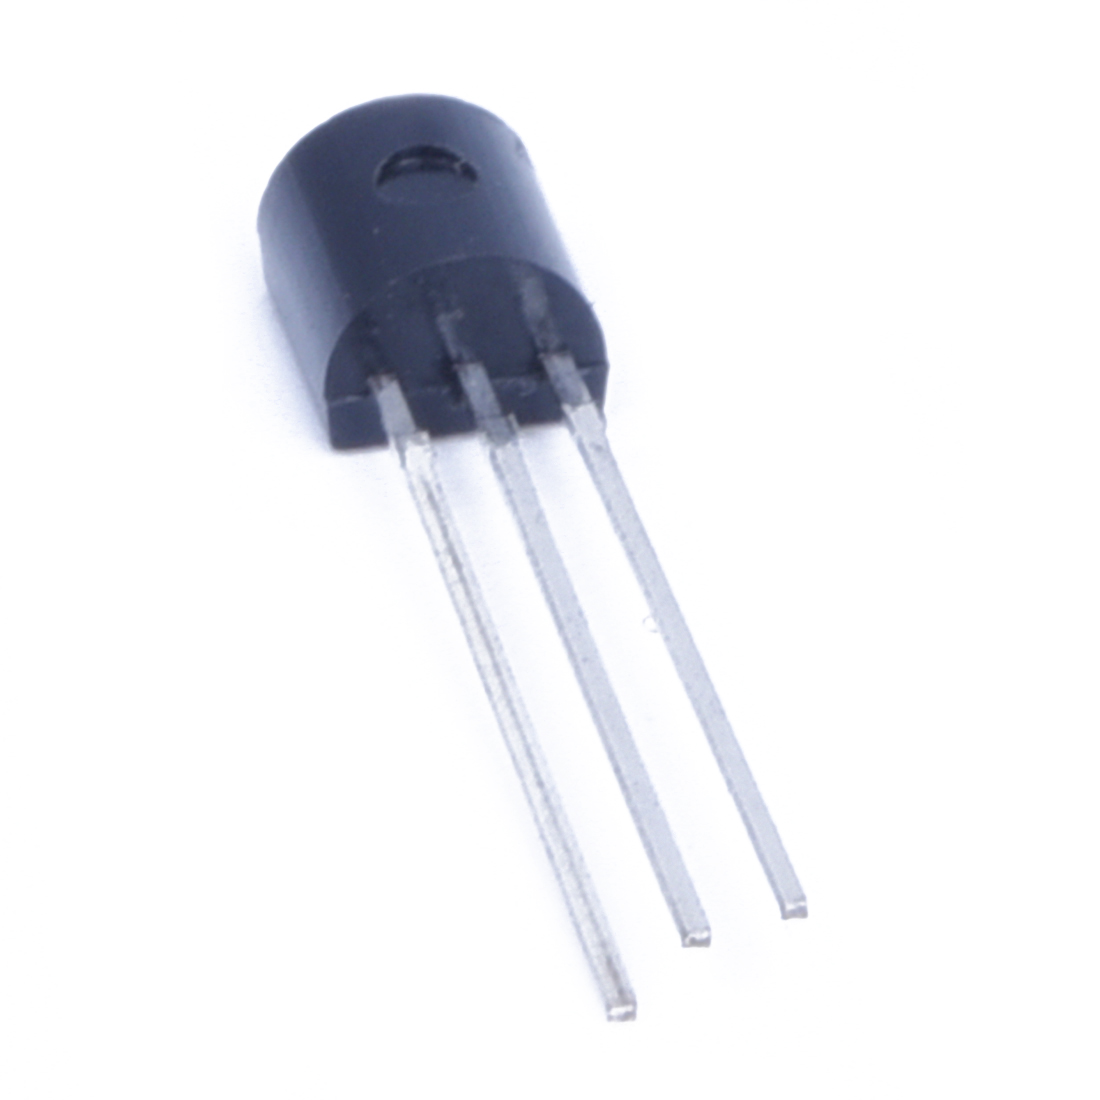 100 Pcs 2N5551 Through Hole NPN Transistors TP